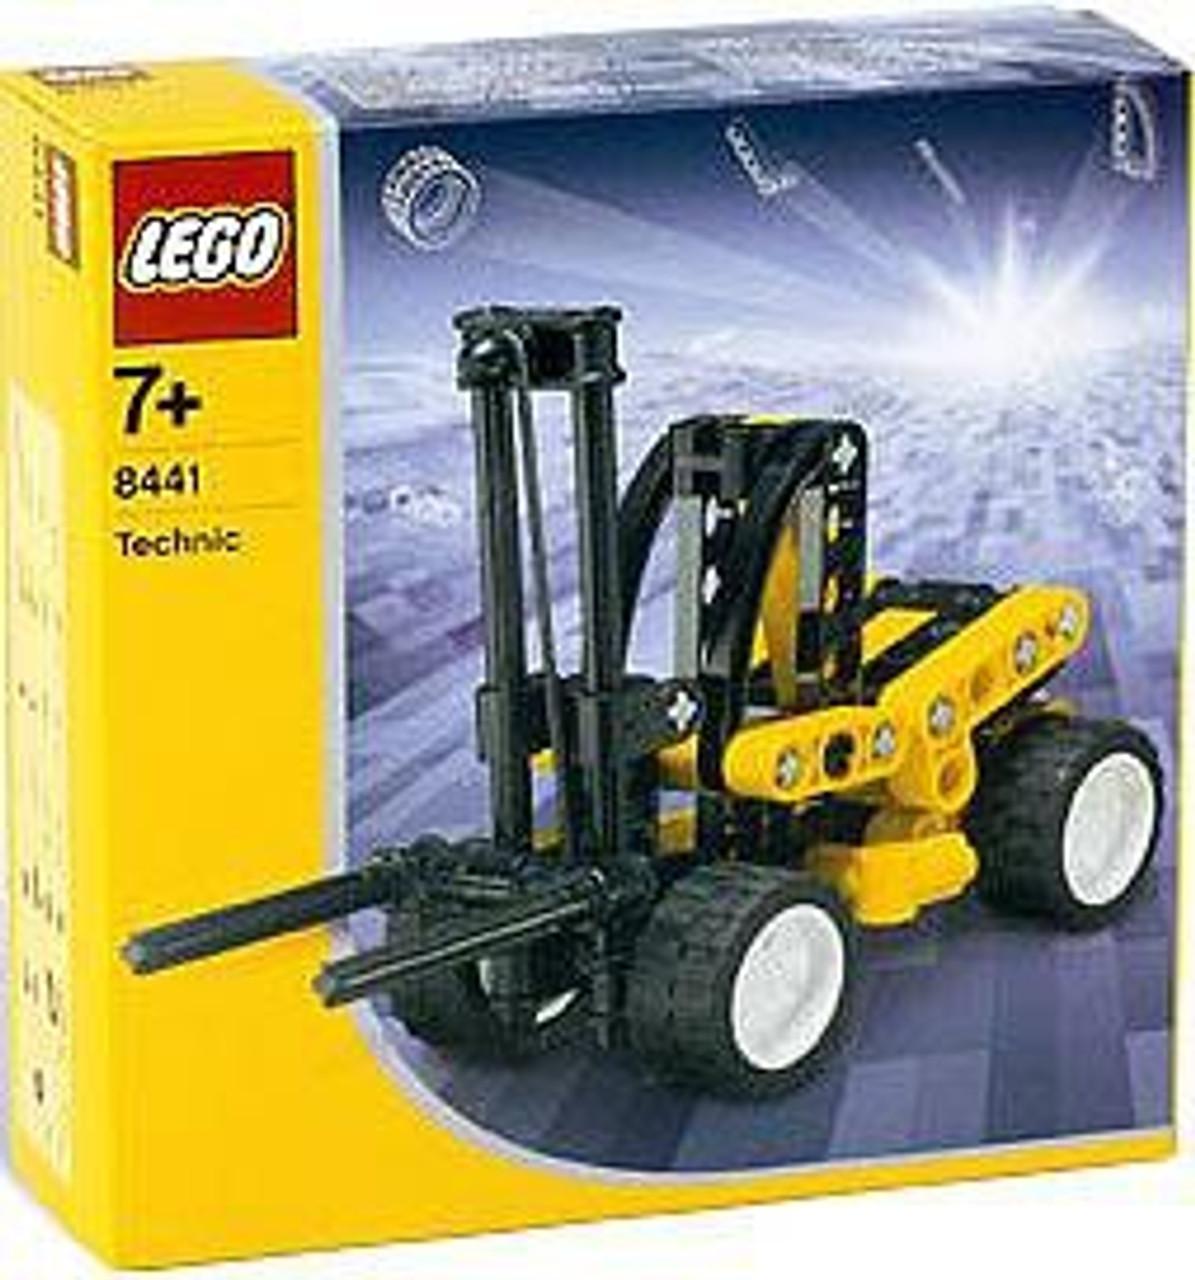 LEGO Technic Fork Lift Truck Set #8441